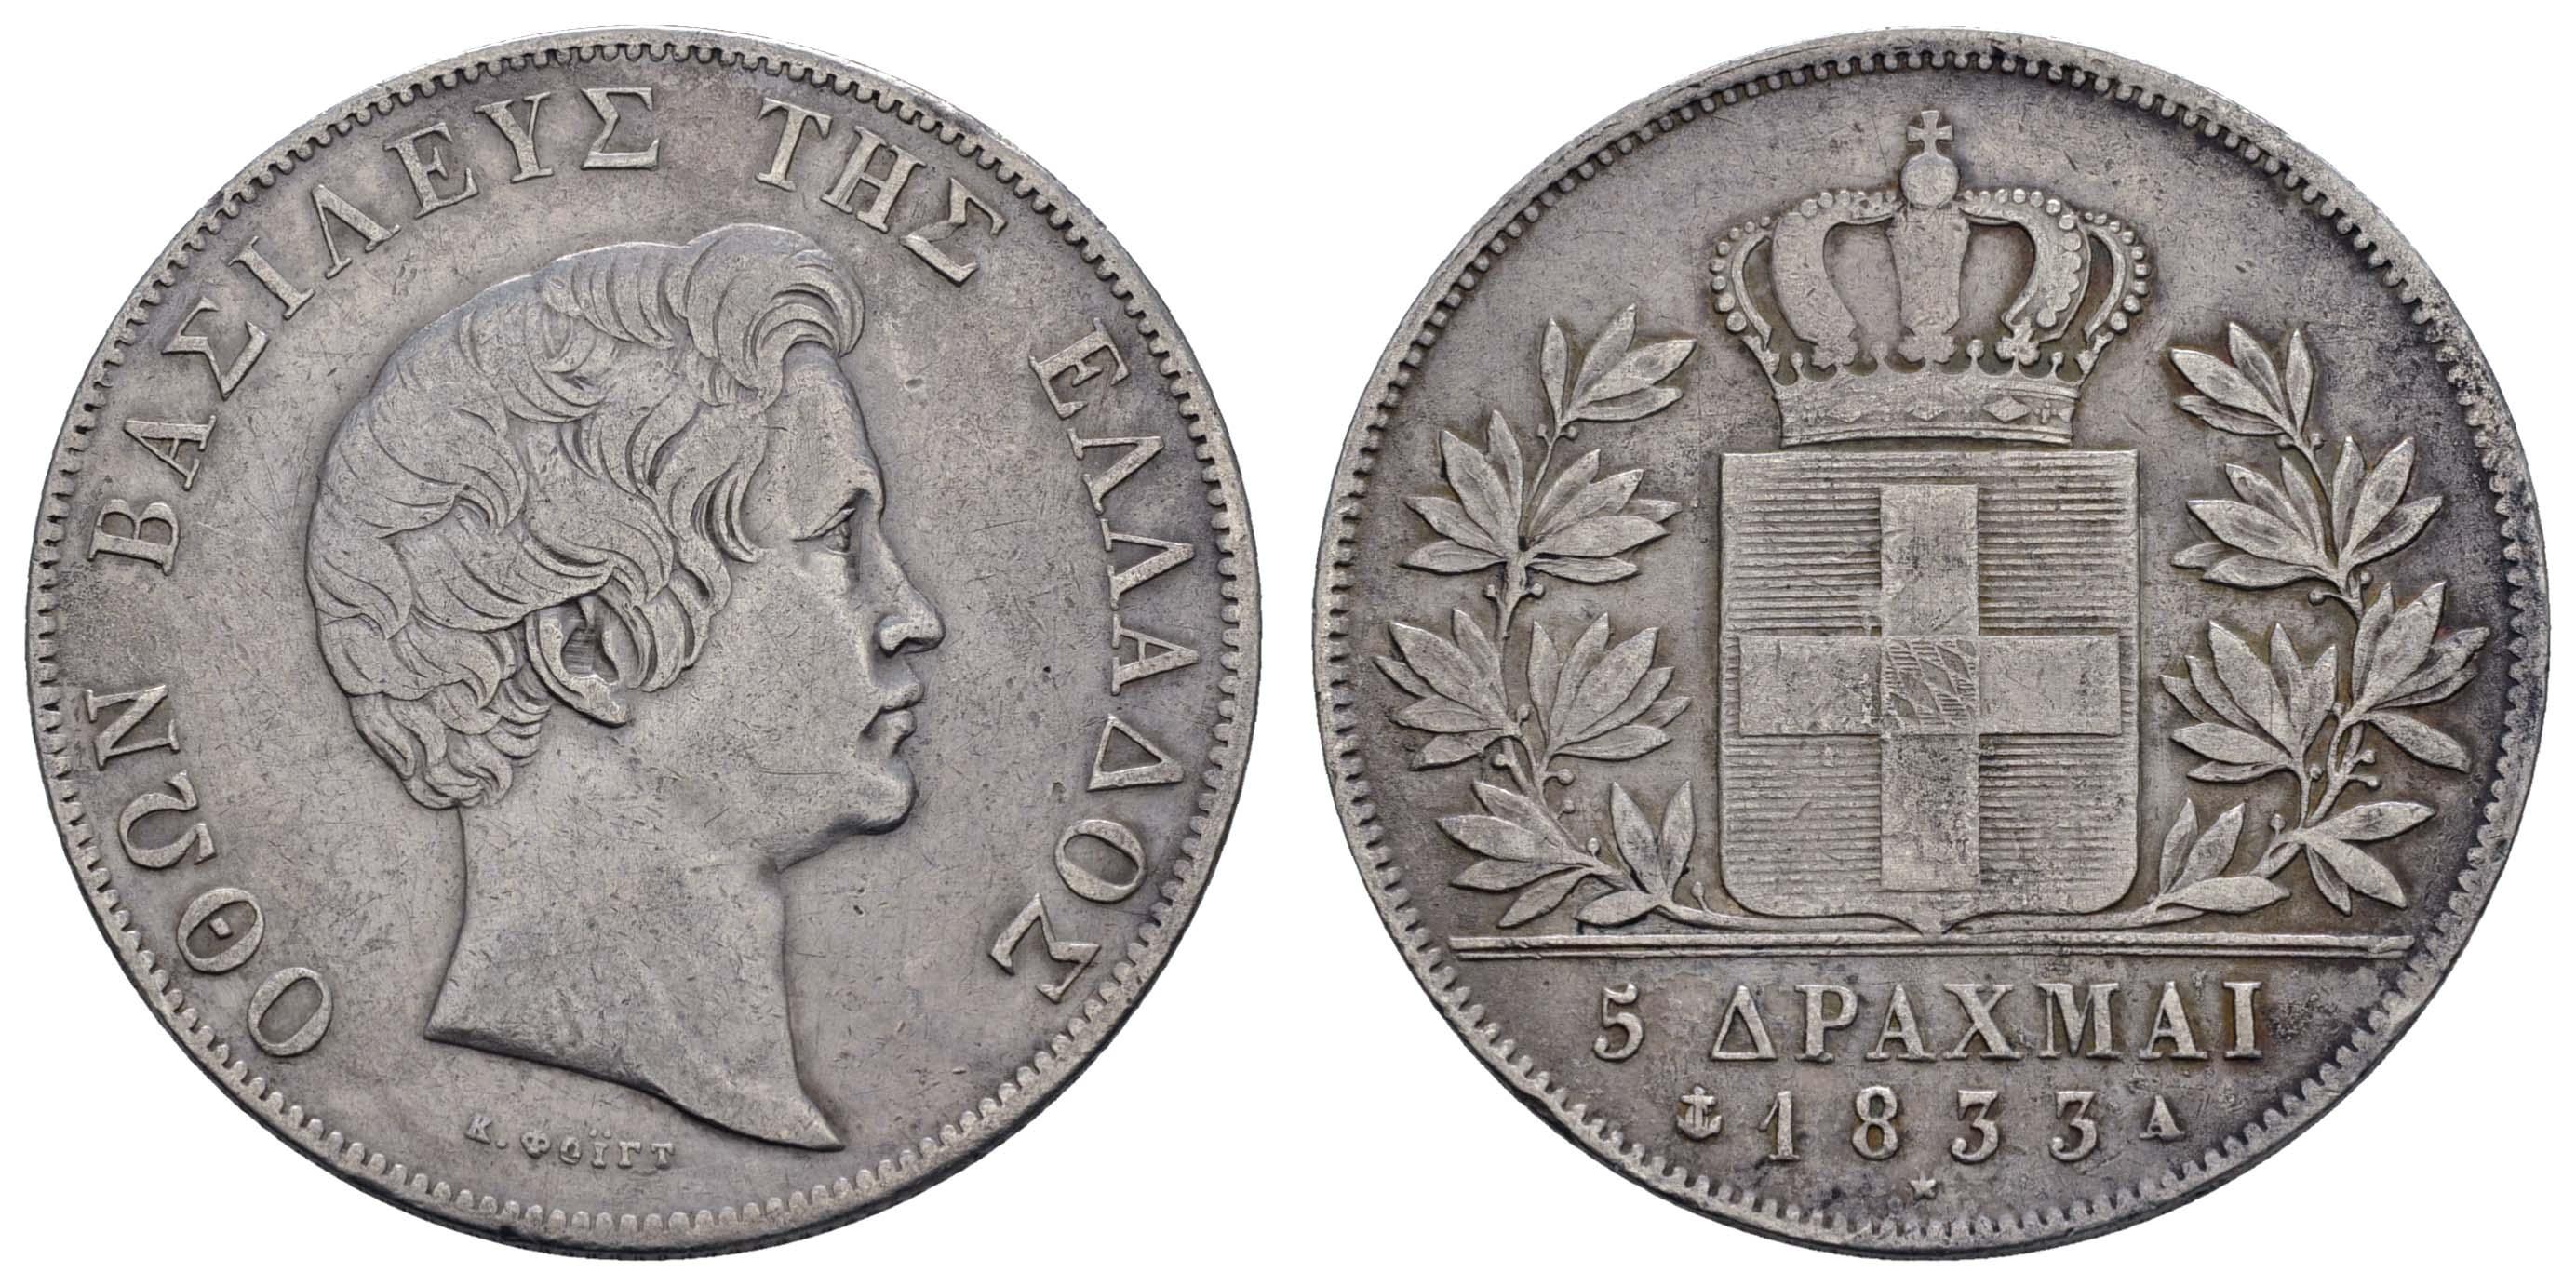 Lot 1557 - europa ab 1800 - Griechenland -  Auktionshaus Ulrich Felzmann GmbH & Co. KG Coins single lots